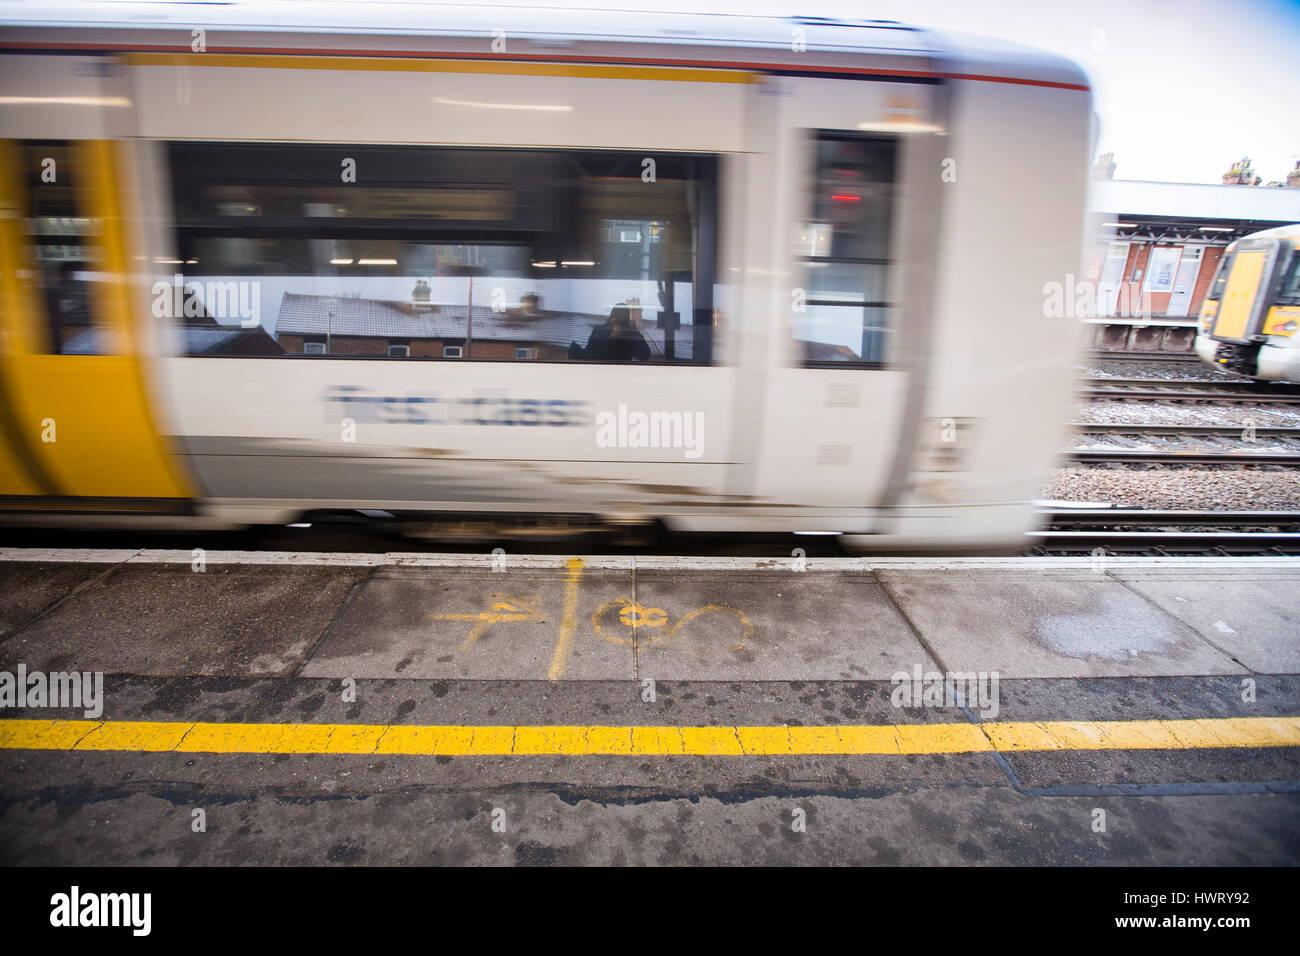 Tonbridge,Kent,UK. A Southeastern railways train exits the platform past the yellow safety line which keeps passengers - Stock Image